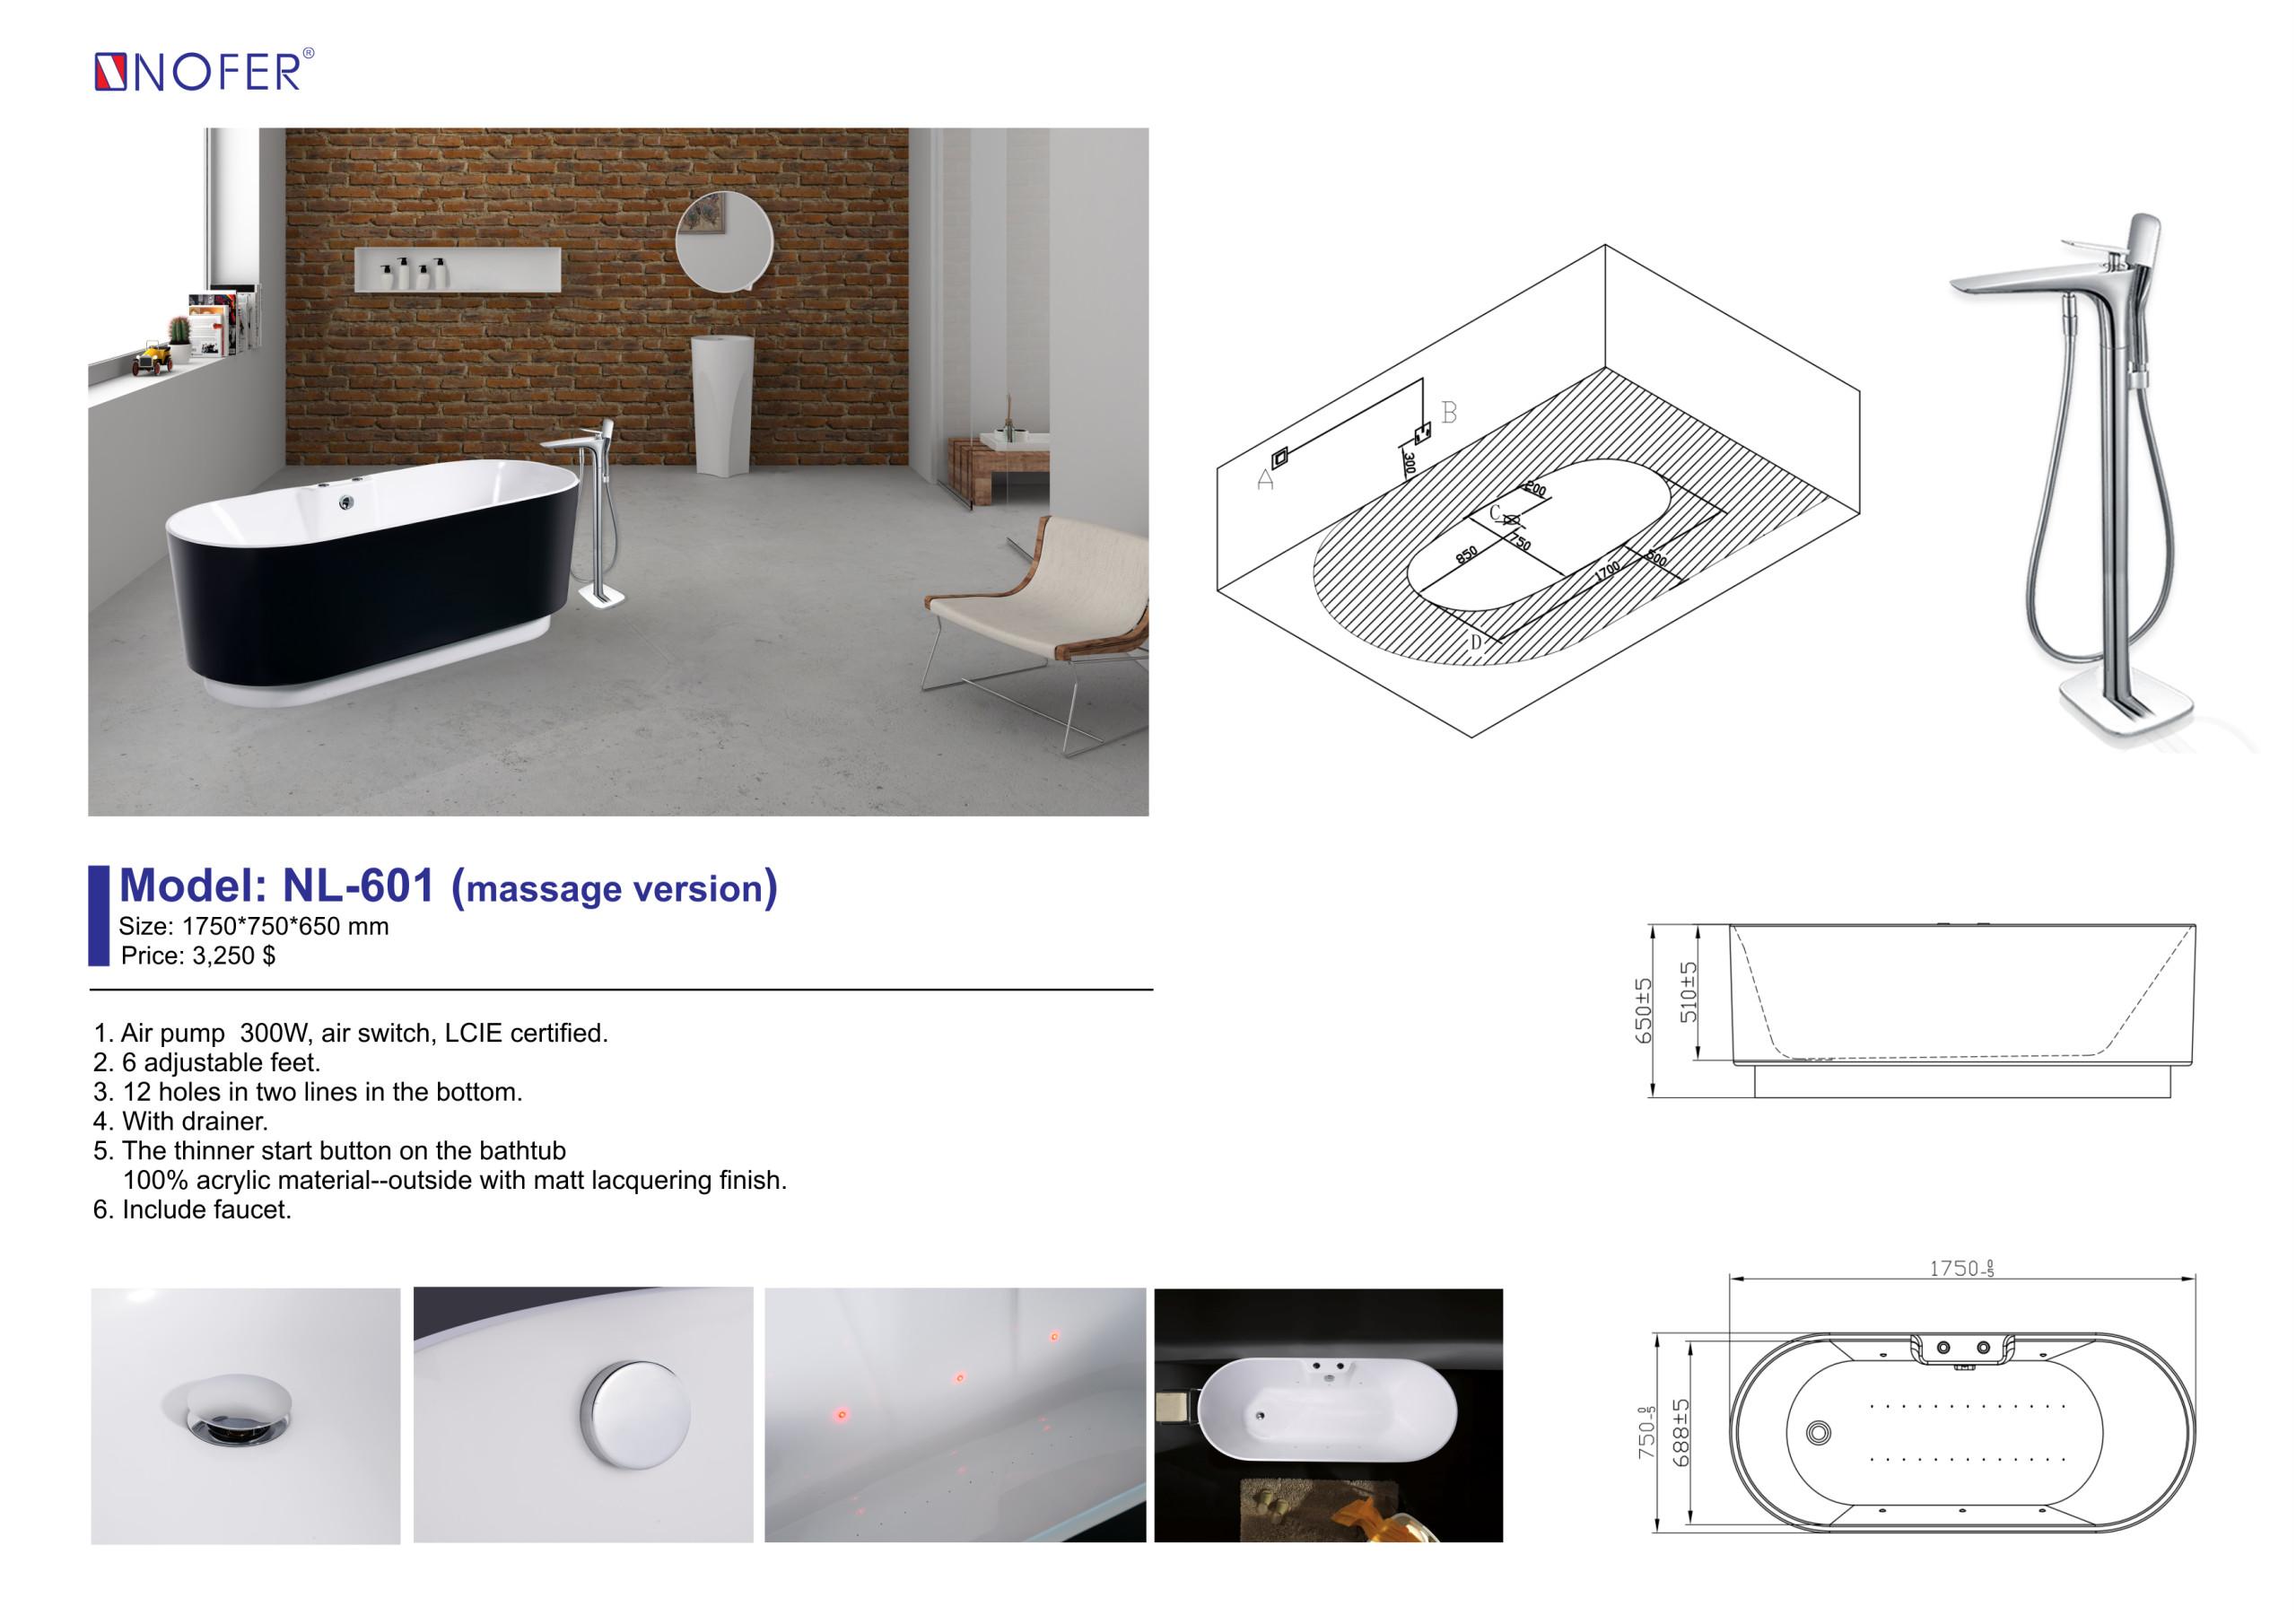 Chi tiết của bồn tắm massage NL-601